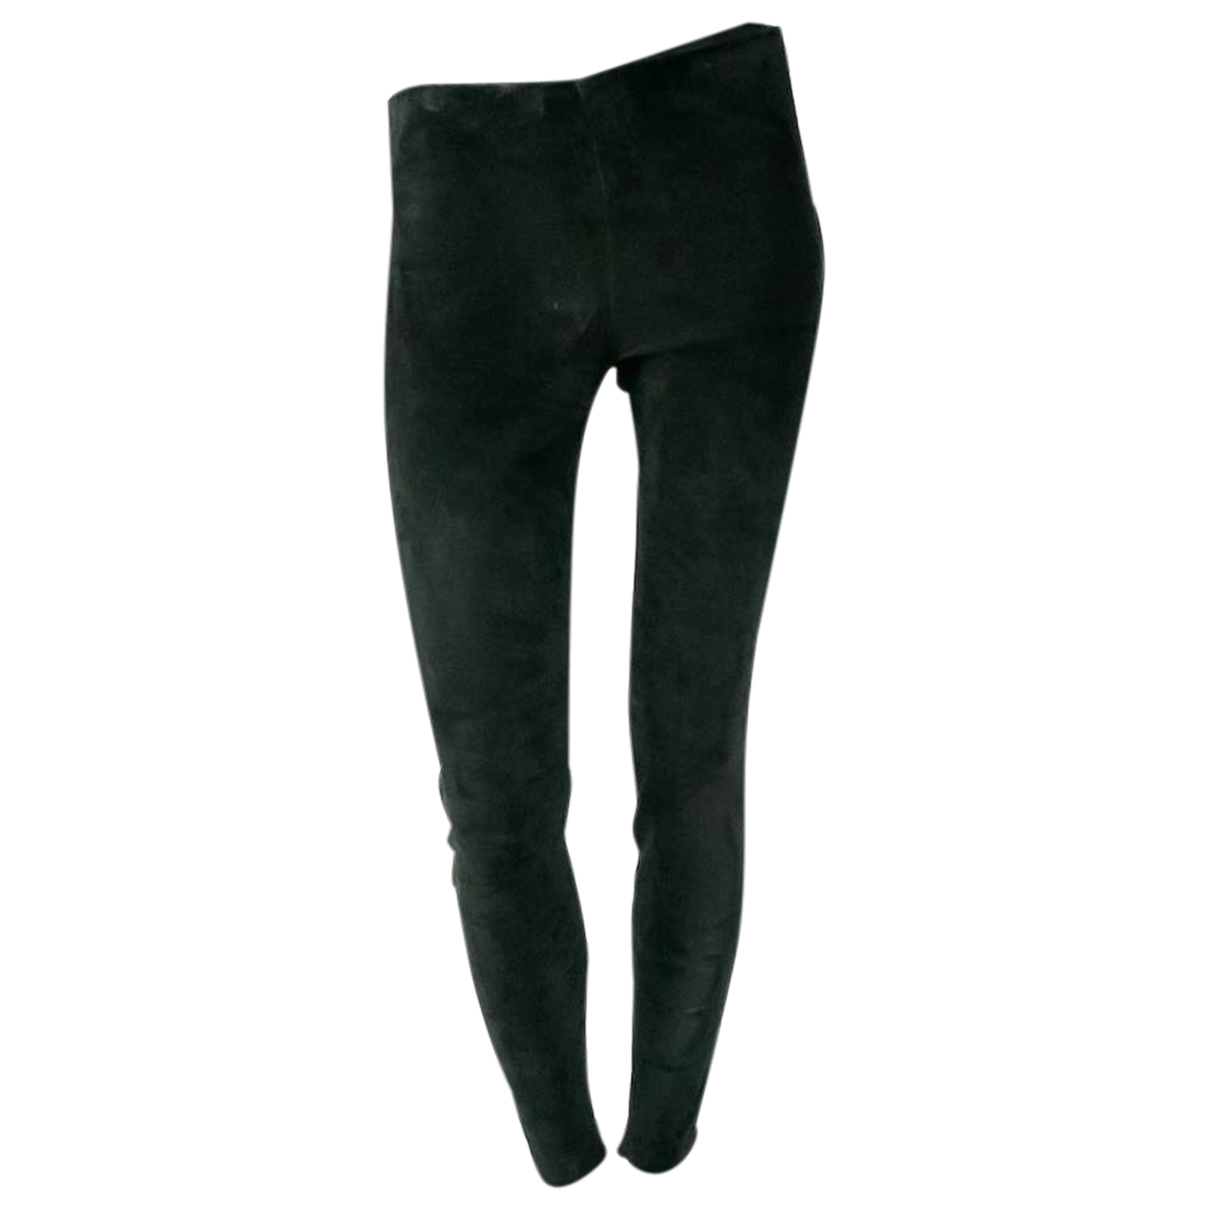 Saint Laurent N Black Suede Trousers for Women 18 US